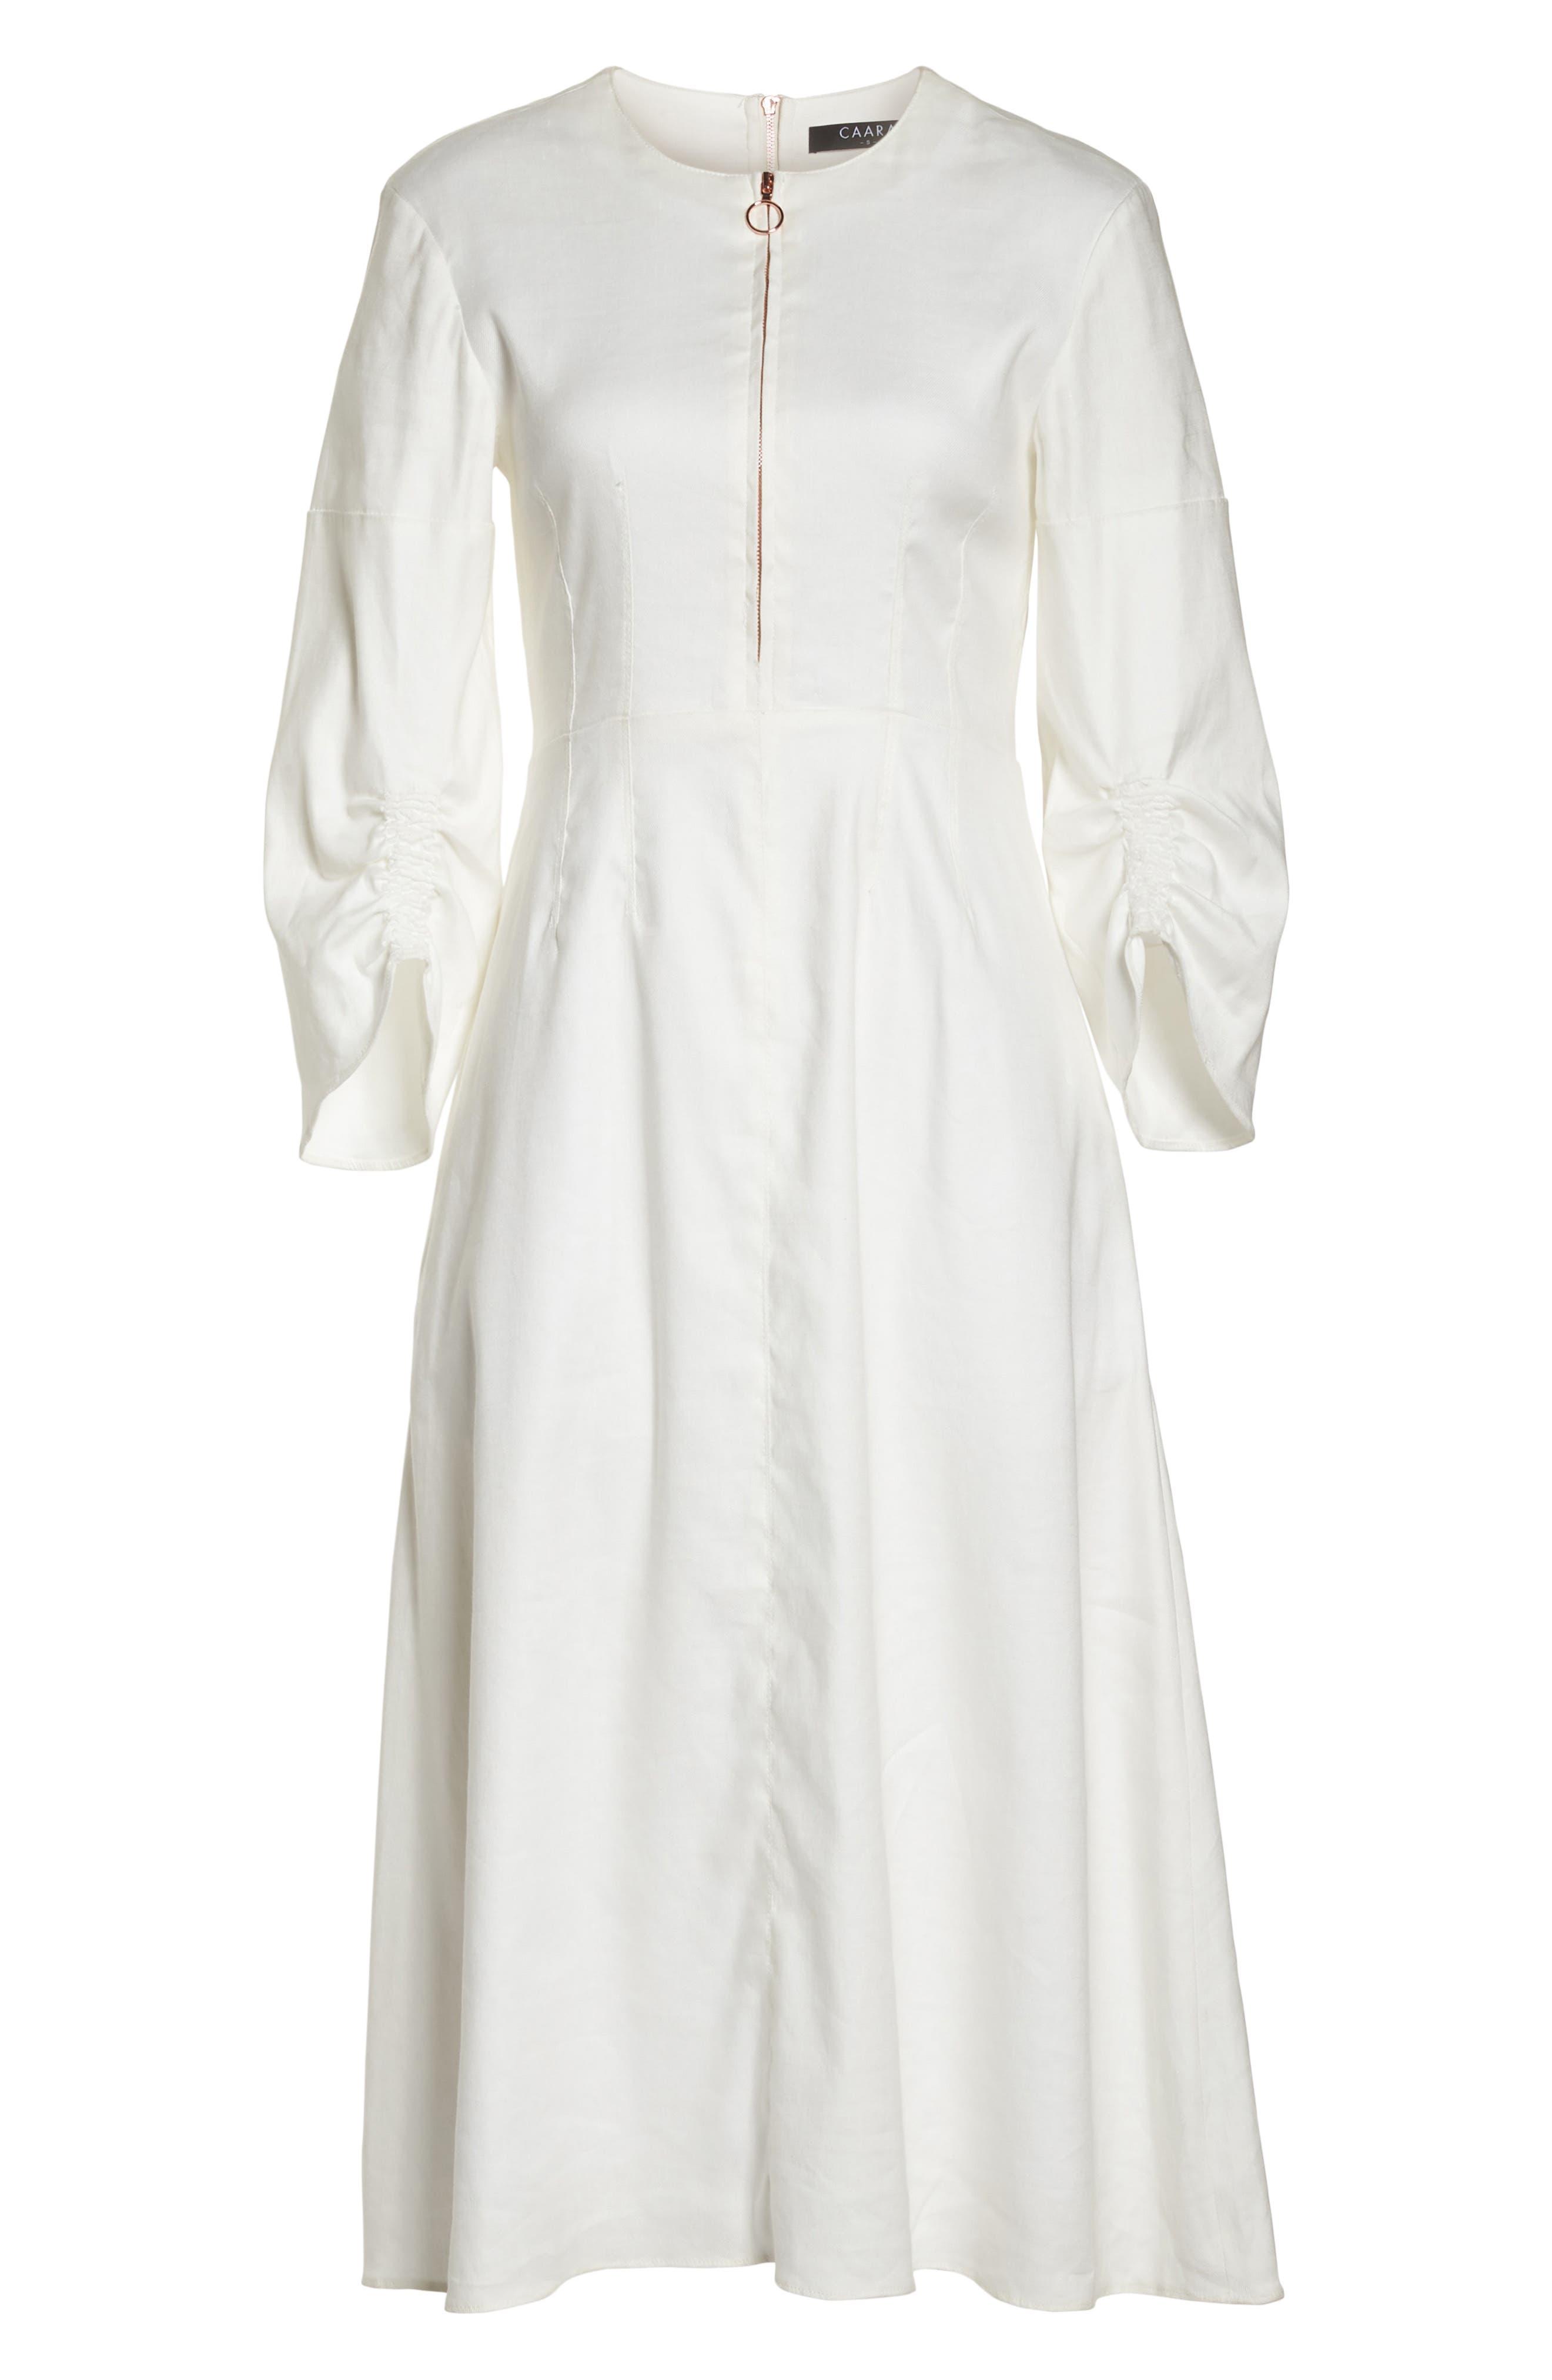 Zip Front Linen Blend Dress,                             Alternate thumbnail 7, color,                             White